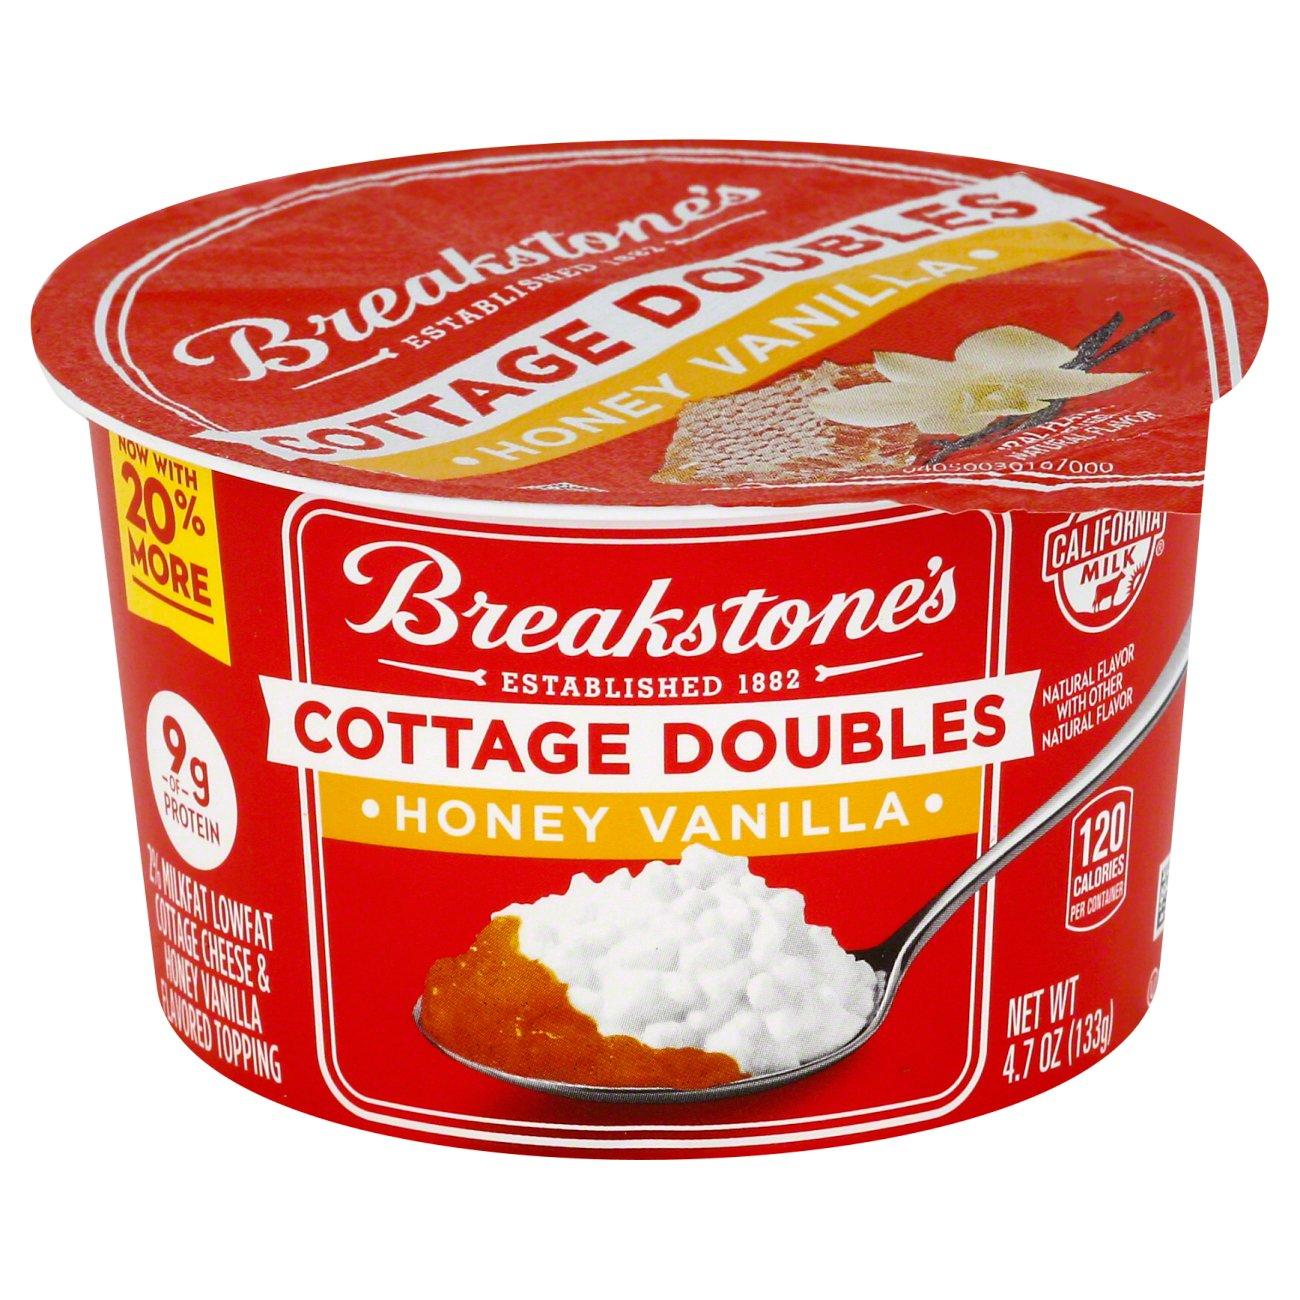 breakstone s cottage doubles honey vanilla shop cottage cheese at heb rh heb com breakstone's cottage cheese breakstones cottage cheese exp date